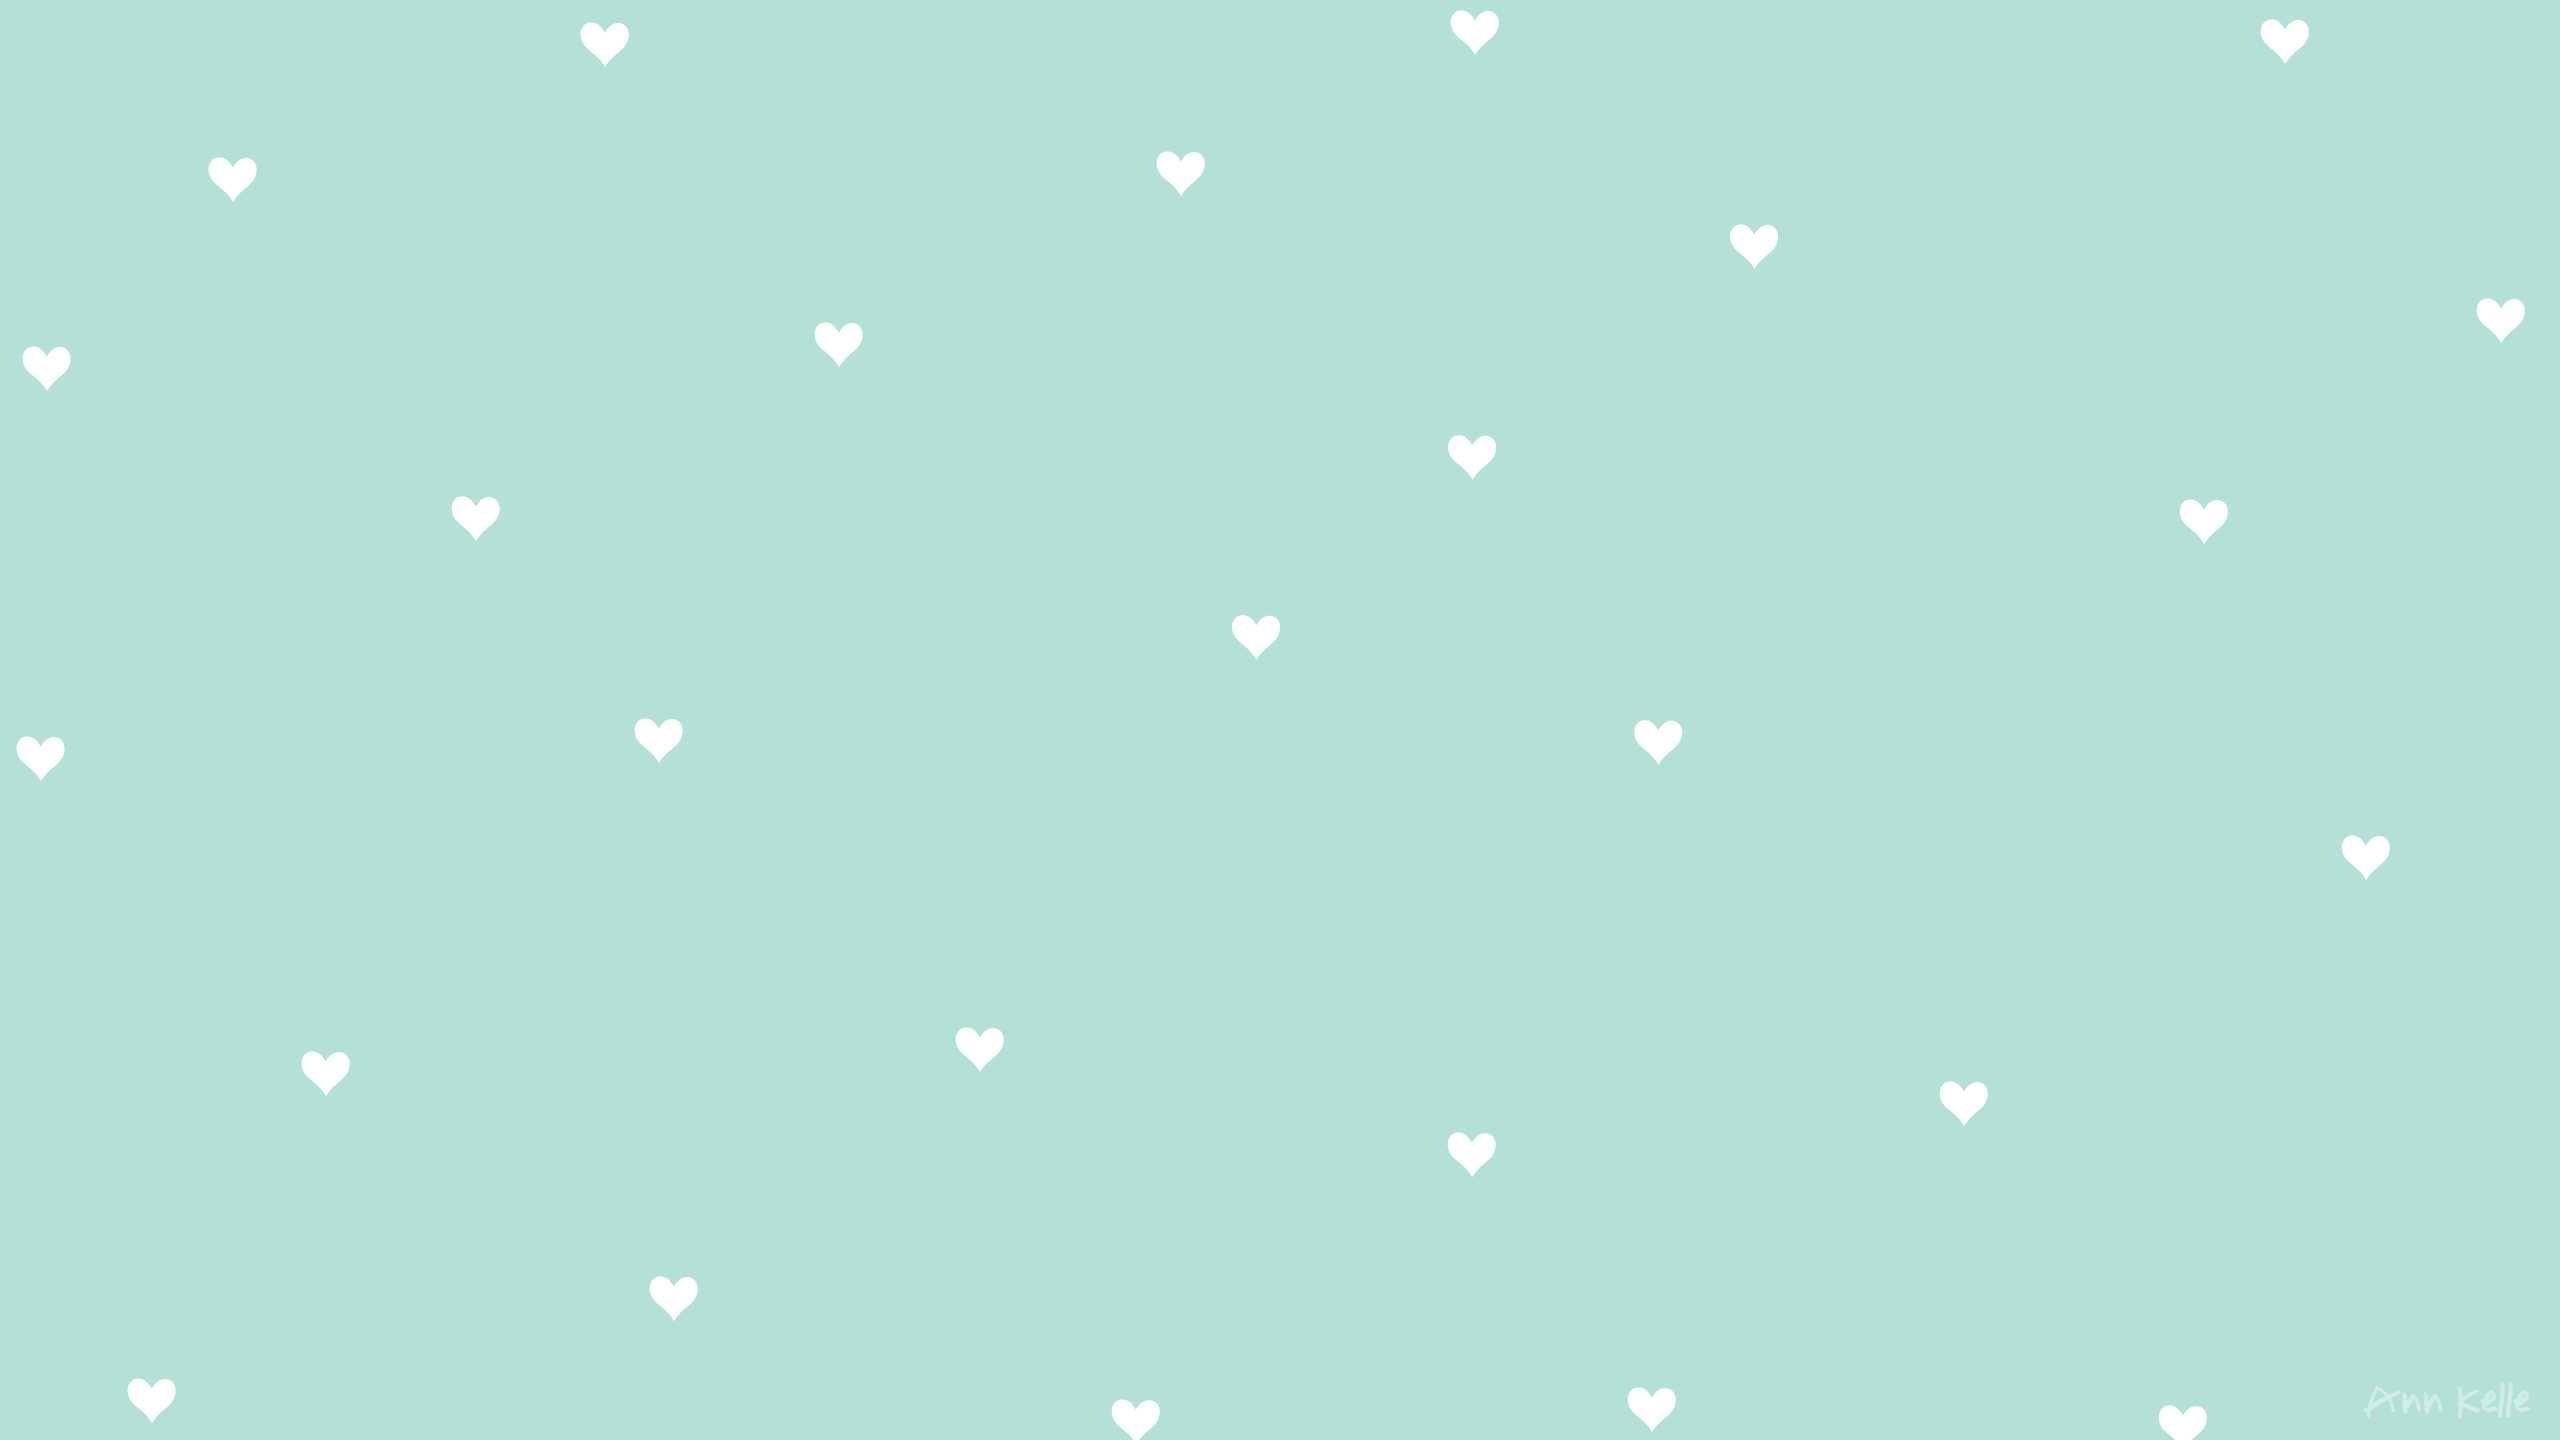 Mint Green Wallpapers - Wallpaper Cave